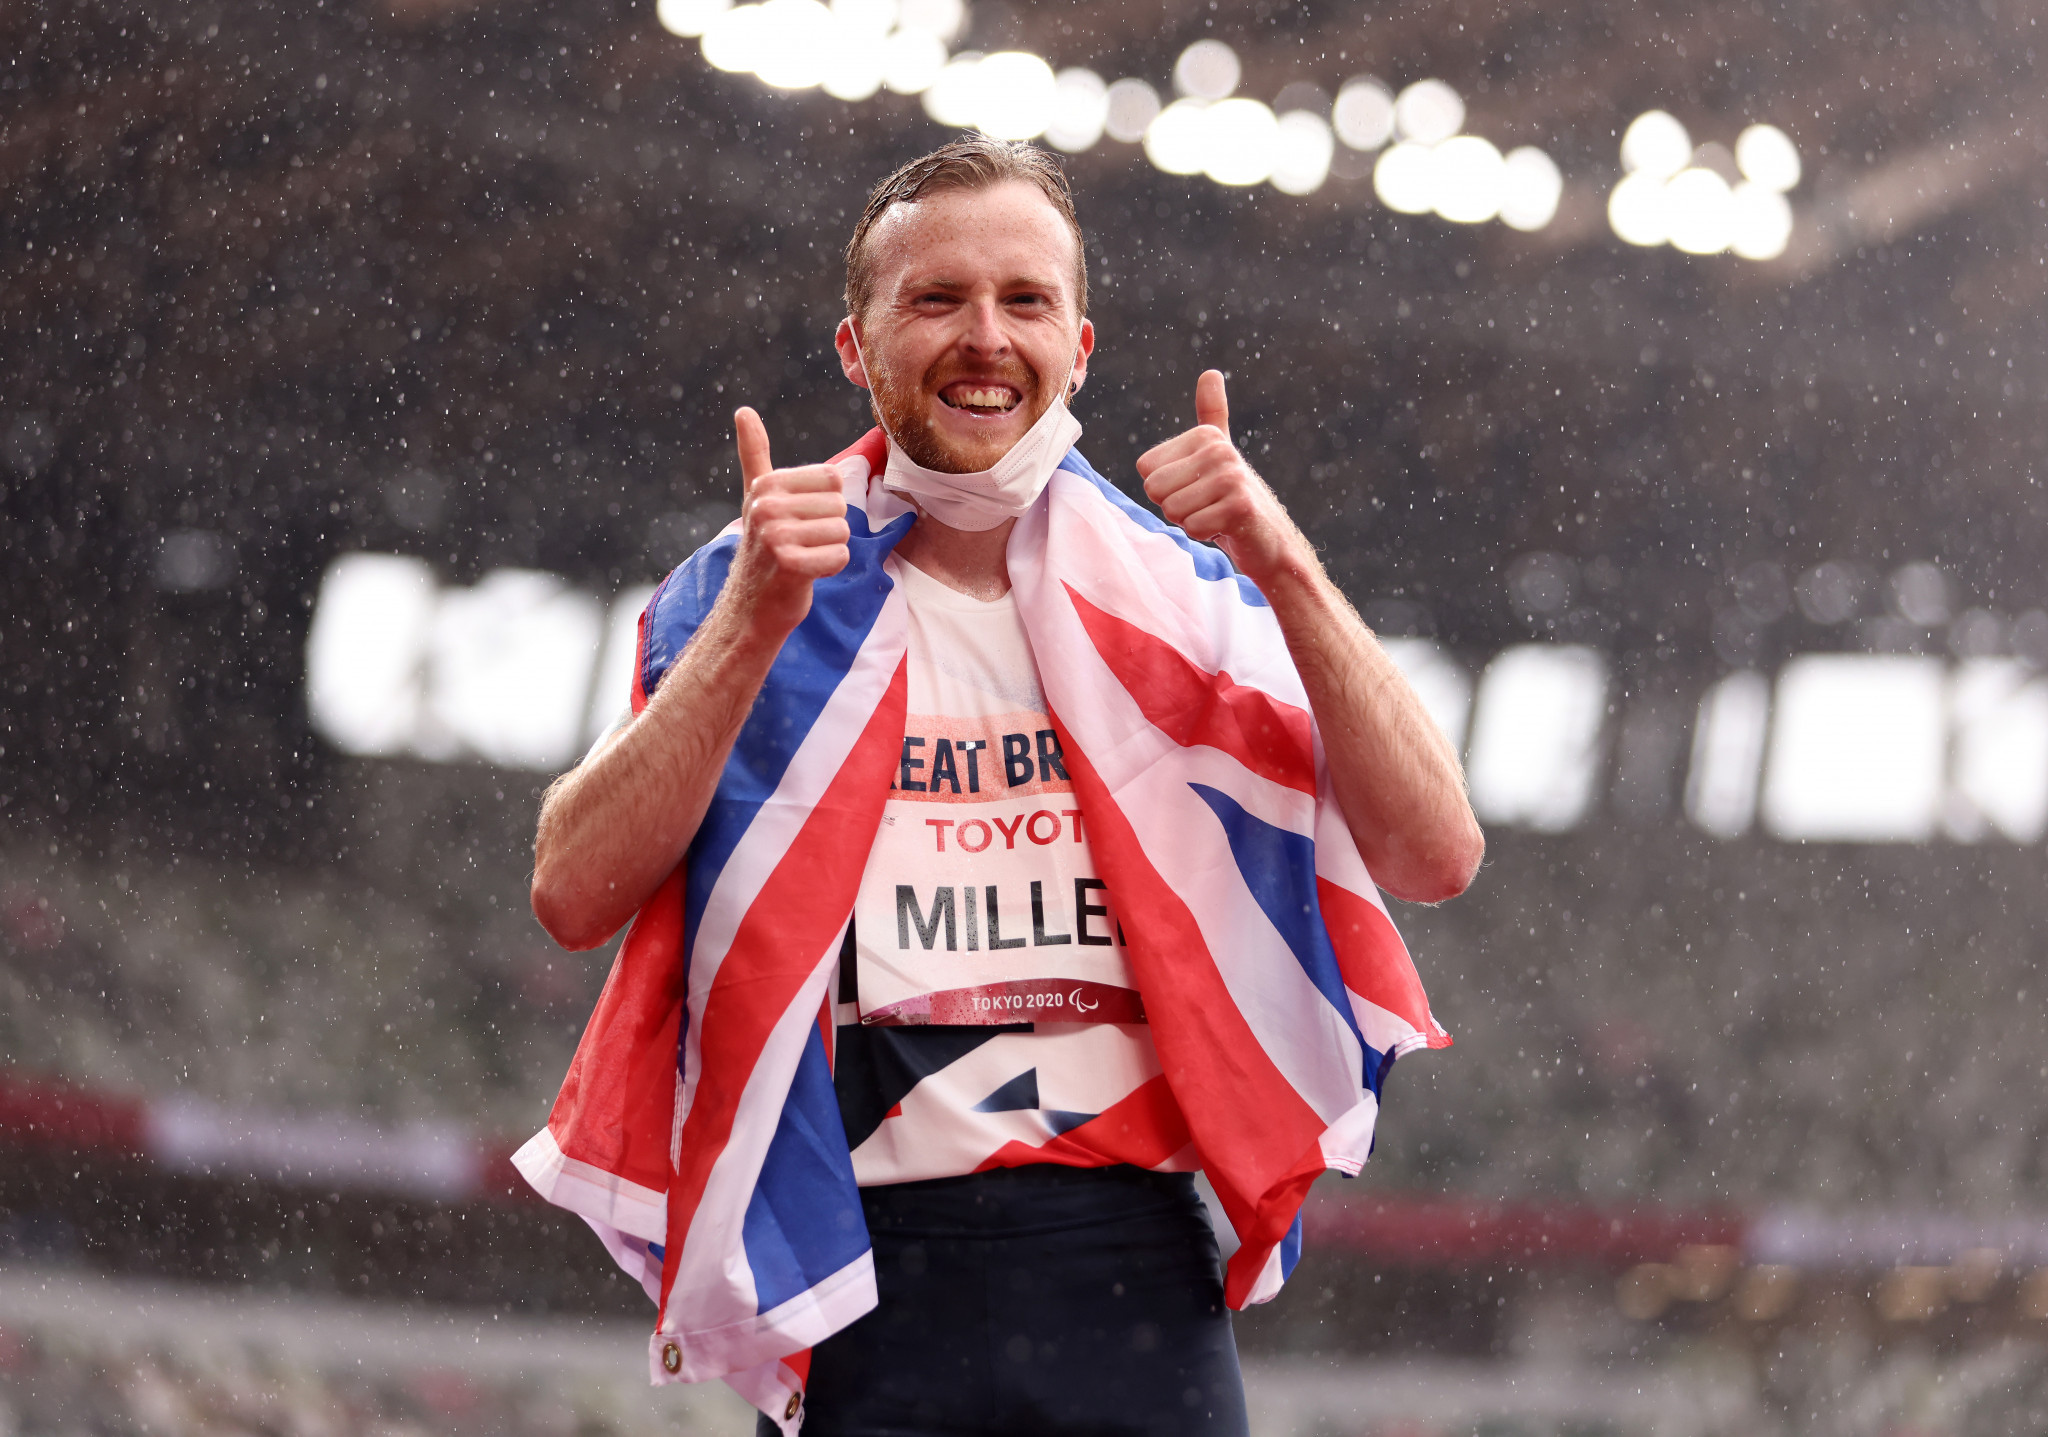 Britain's Owen Miller won the men's T20 1500m with a gallant effort ©Getty Images